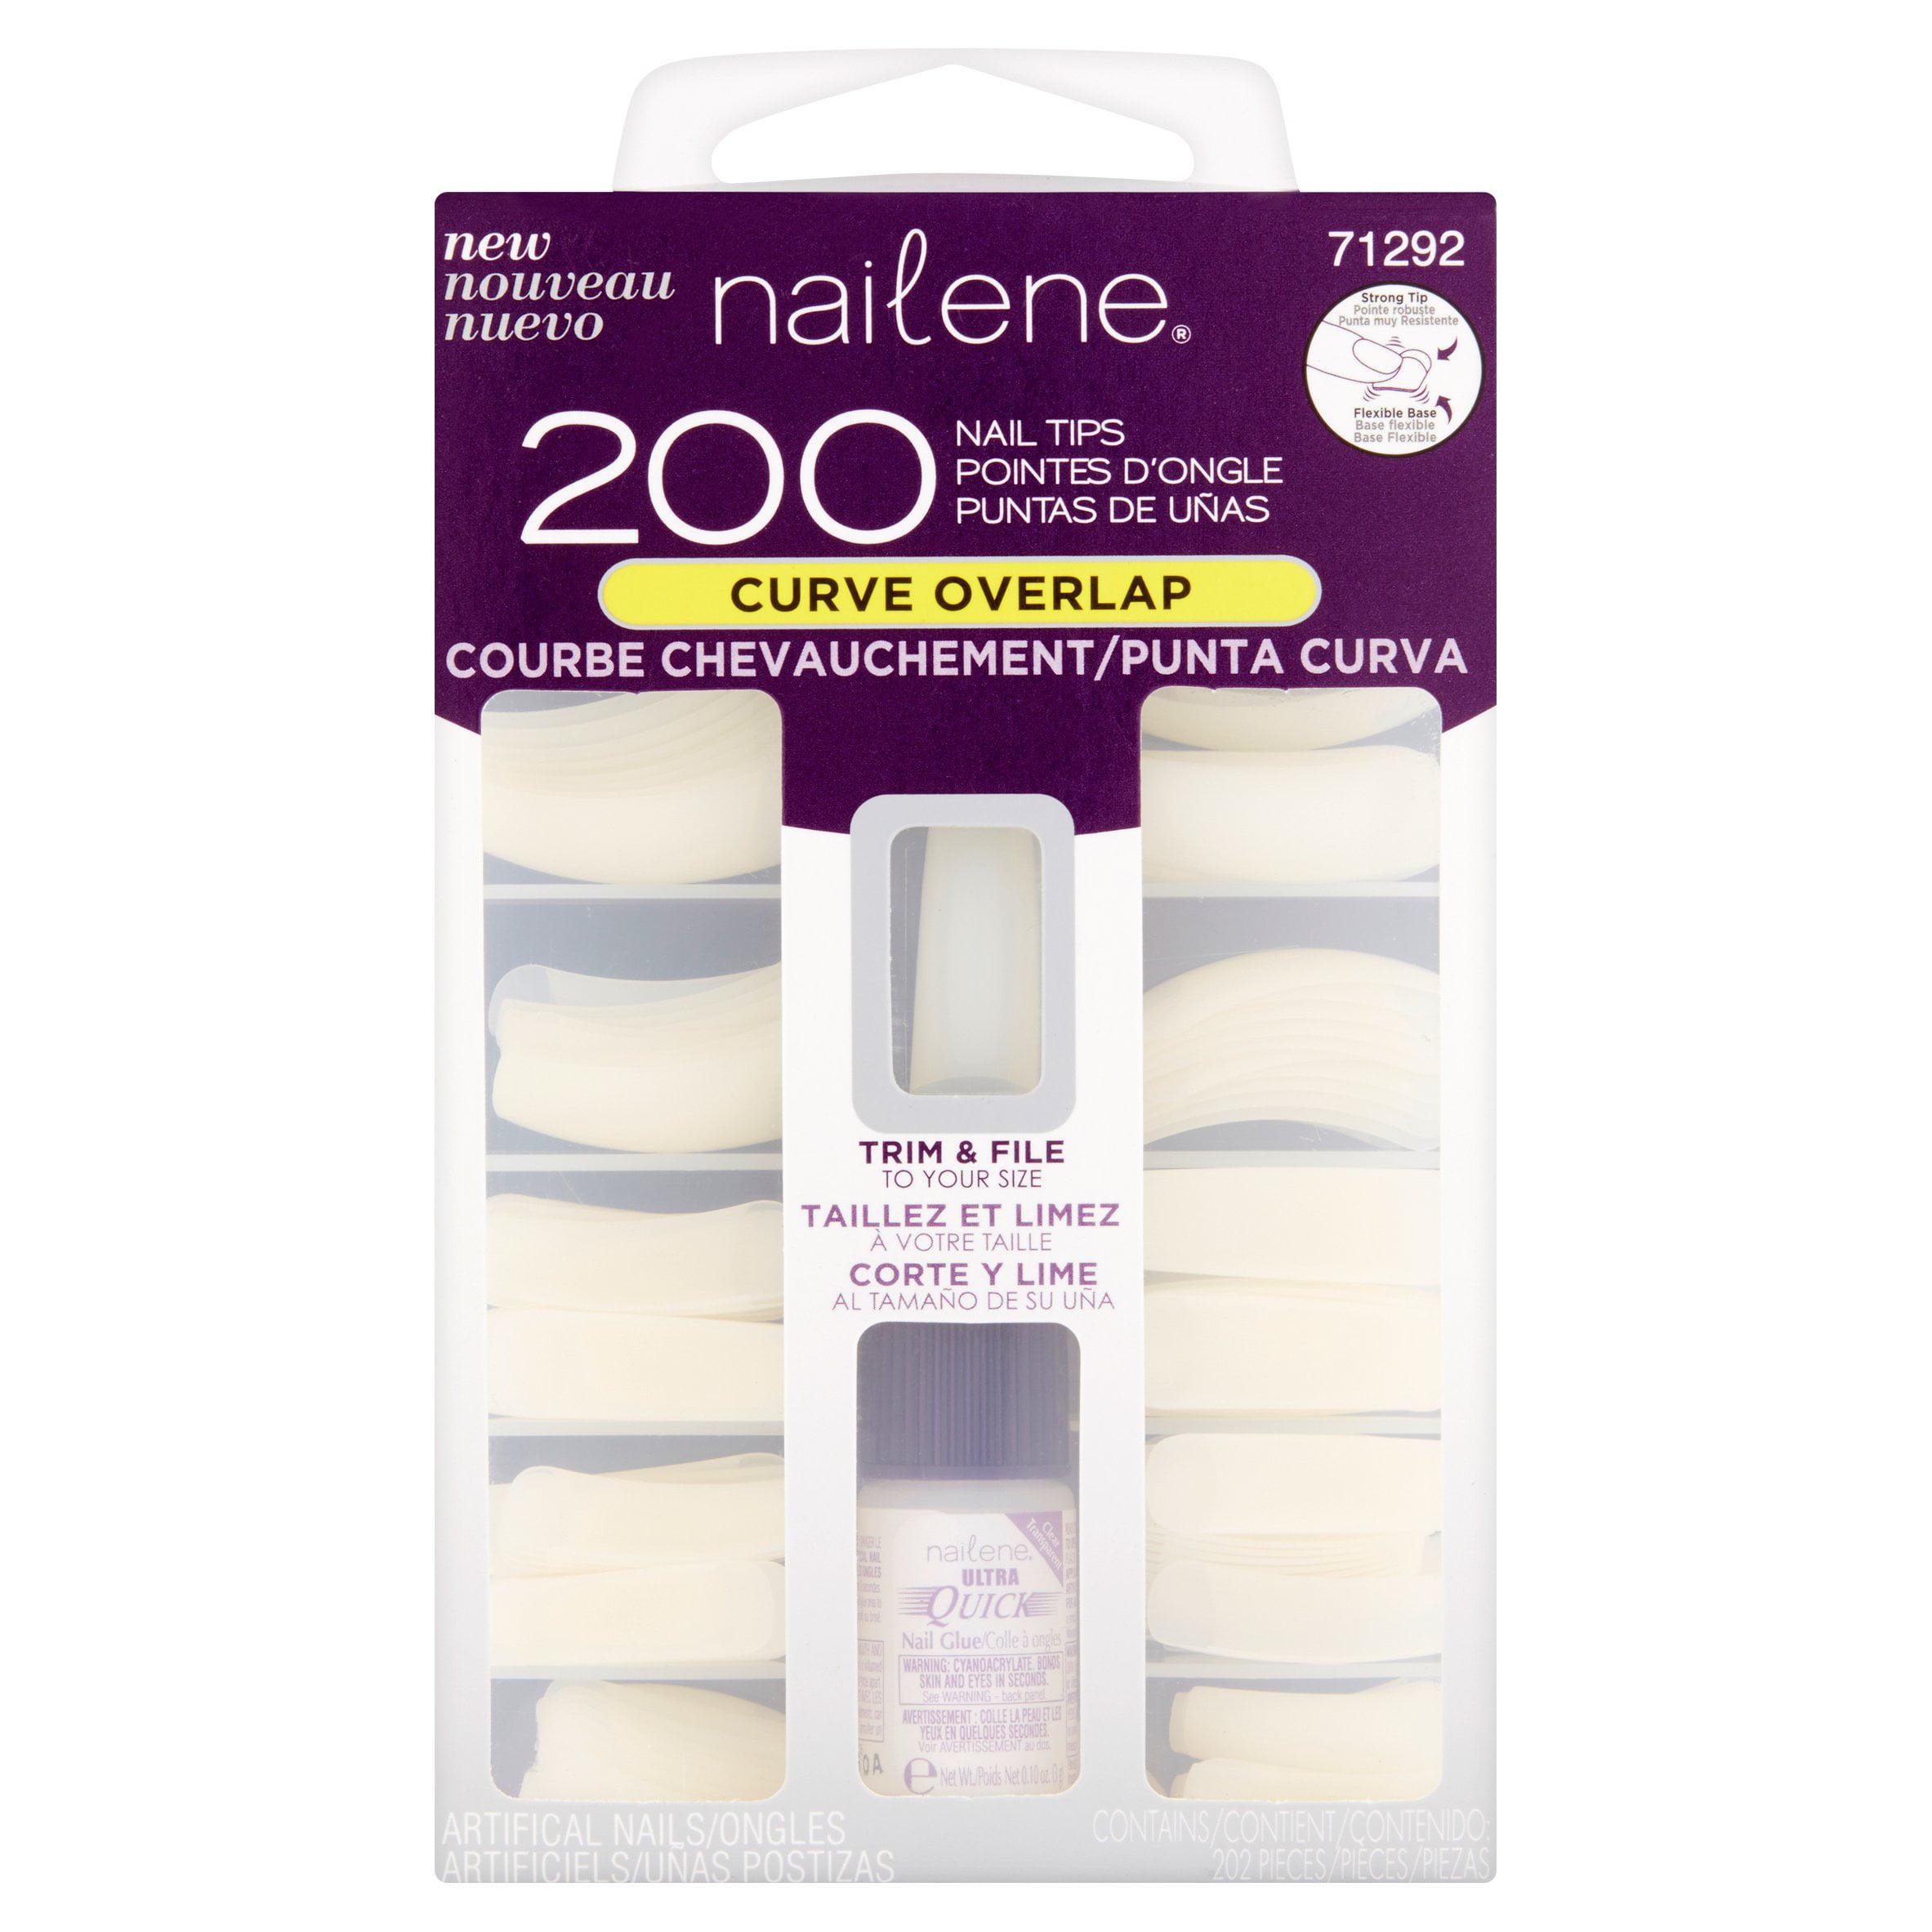 Nailene Nail Tips Curve Overlap, 200 count